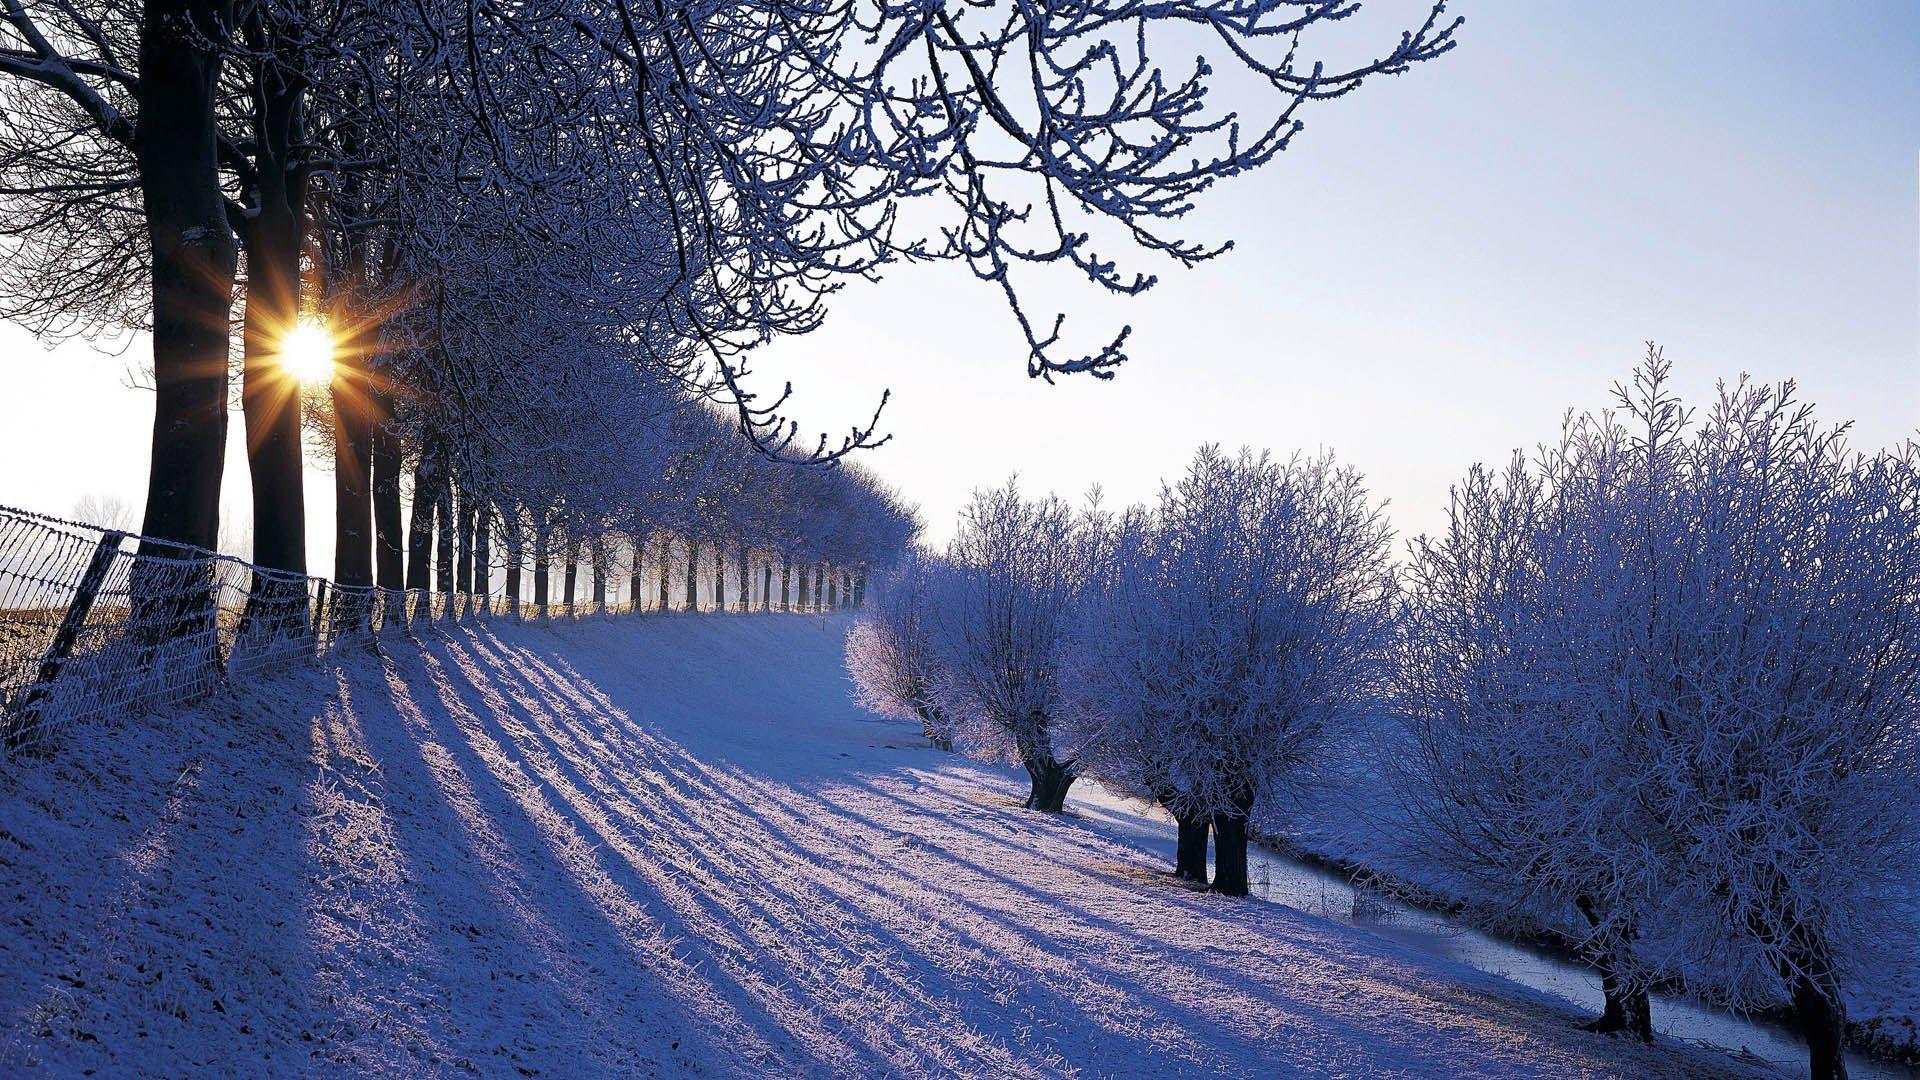 Winter Scene beautiful wallpaper